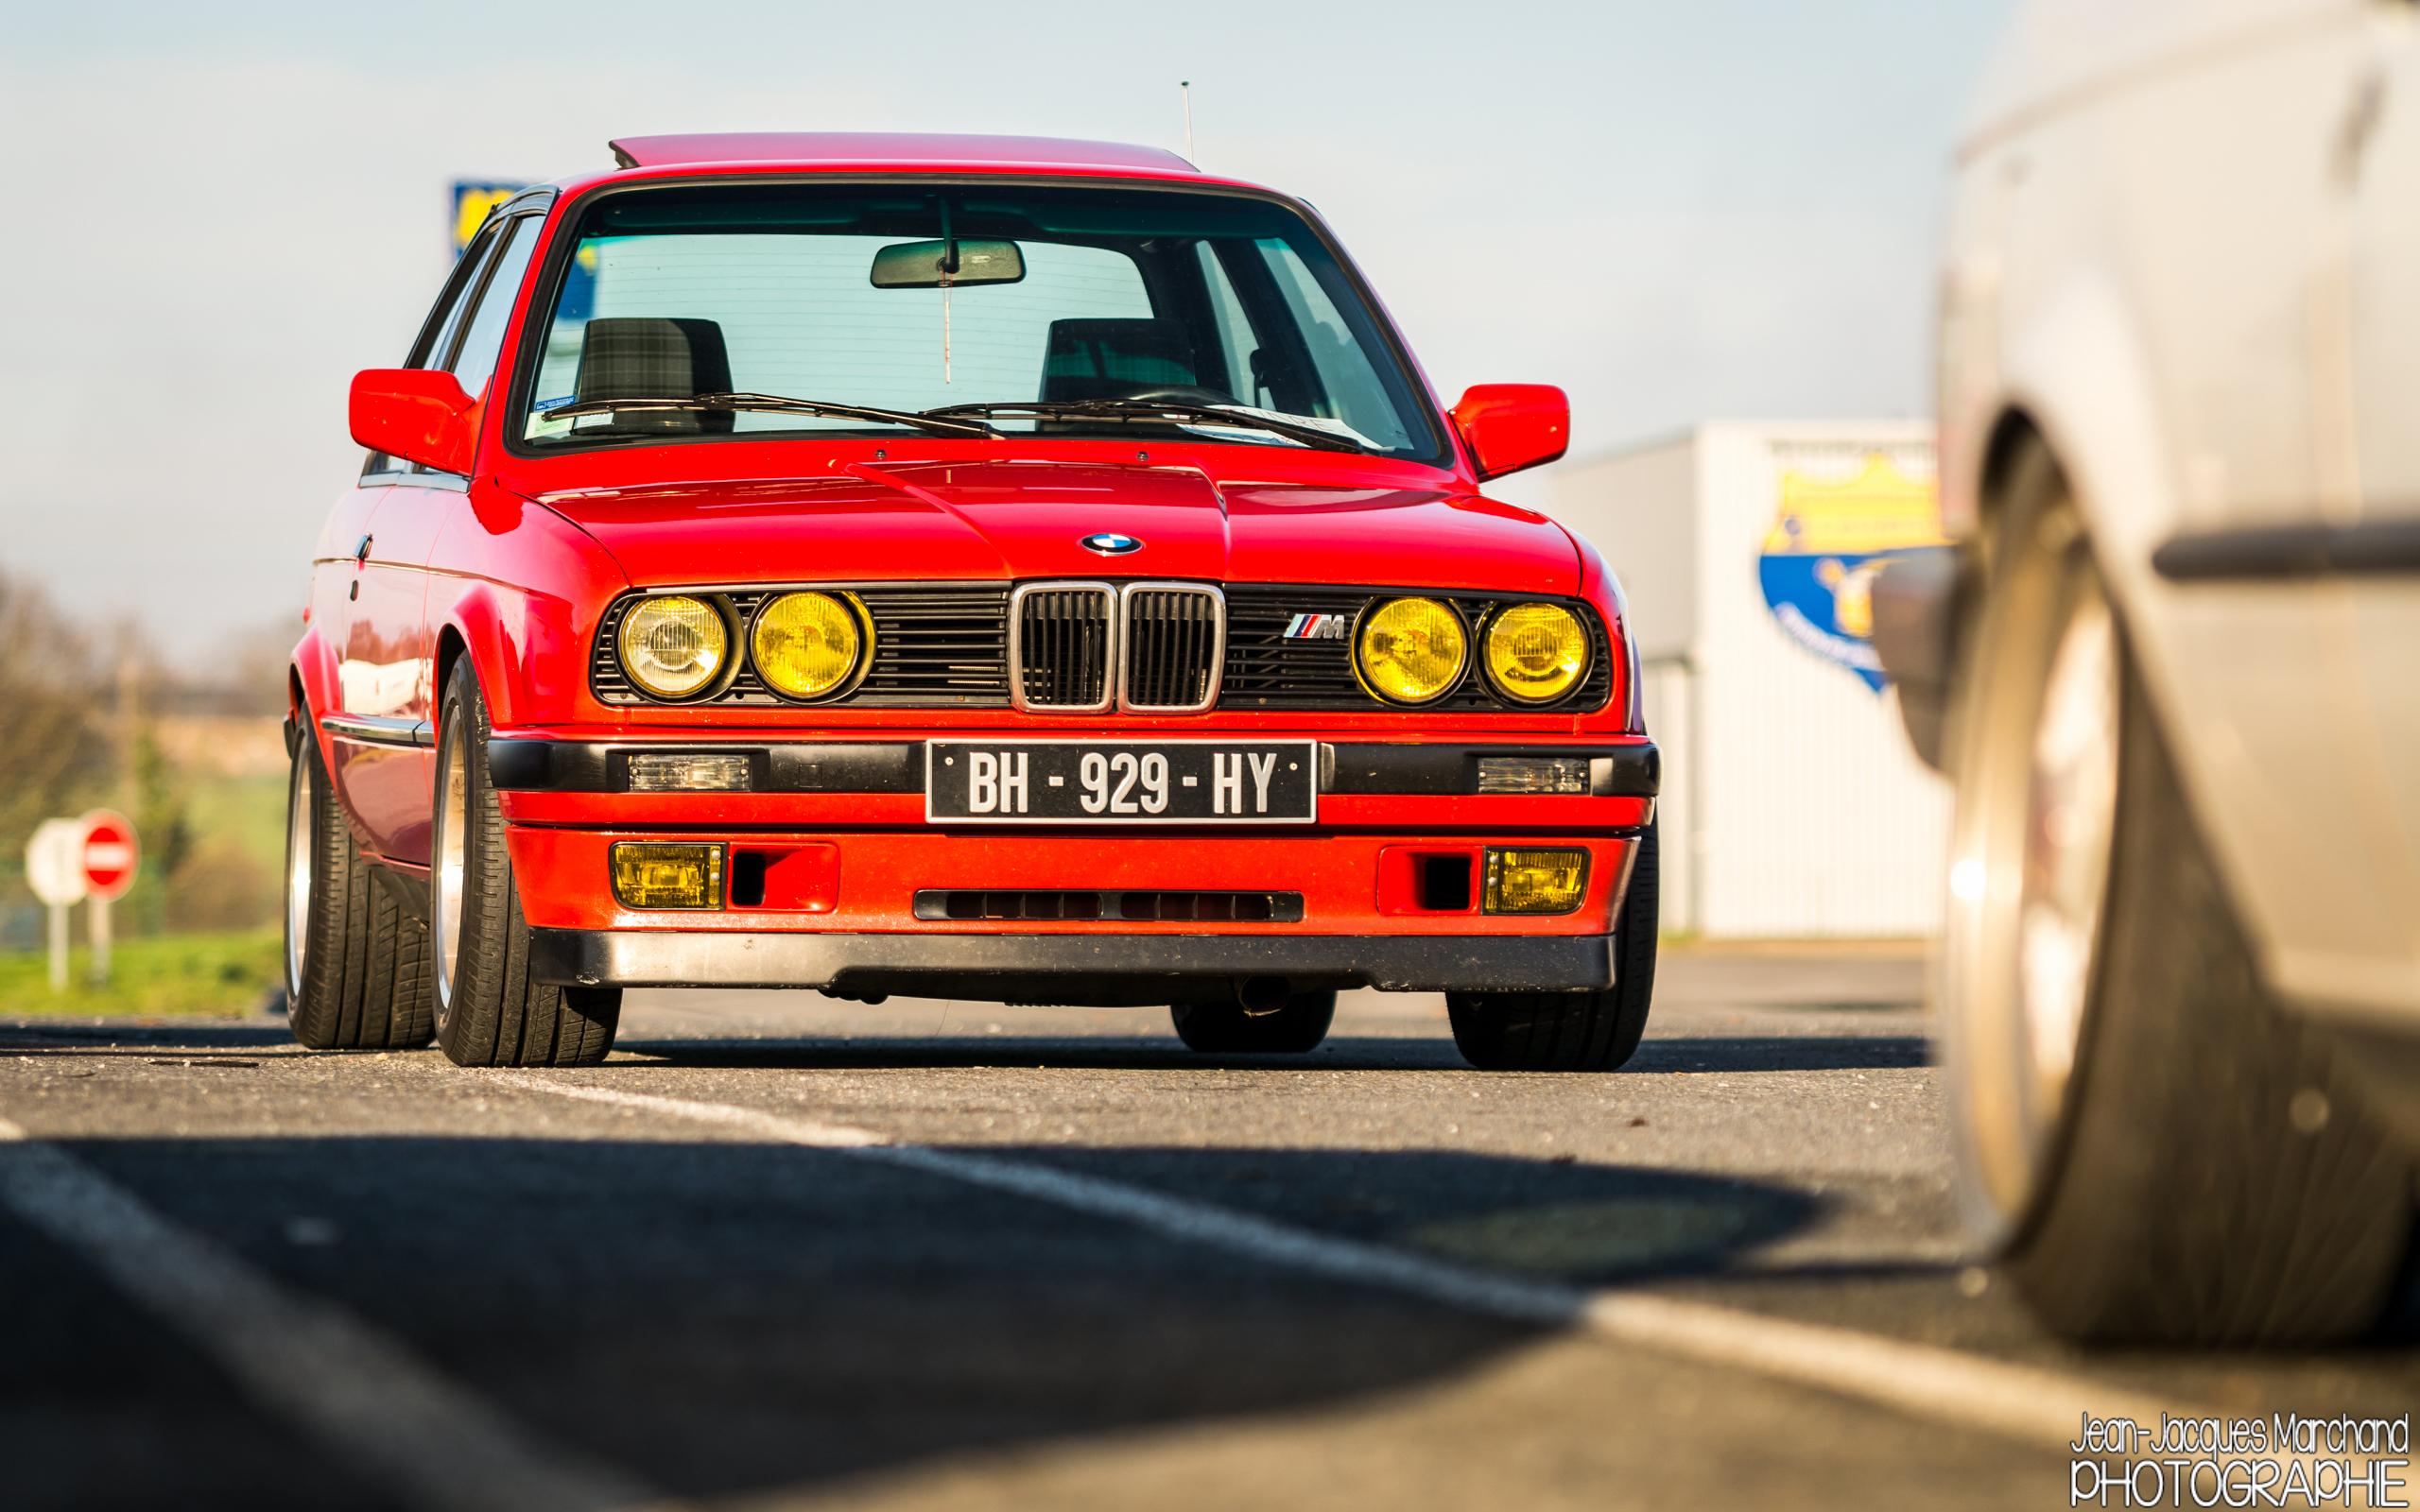 Wallpaper : Red, BMW, Nikon, Sports Car, Performance Car, Rouge, German,  Low, Sedan, Rennes, F28, 70200, Is, Cars, Automobile, Sigma, D7100, Euro,  ...